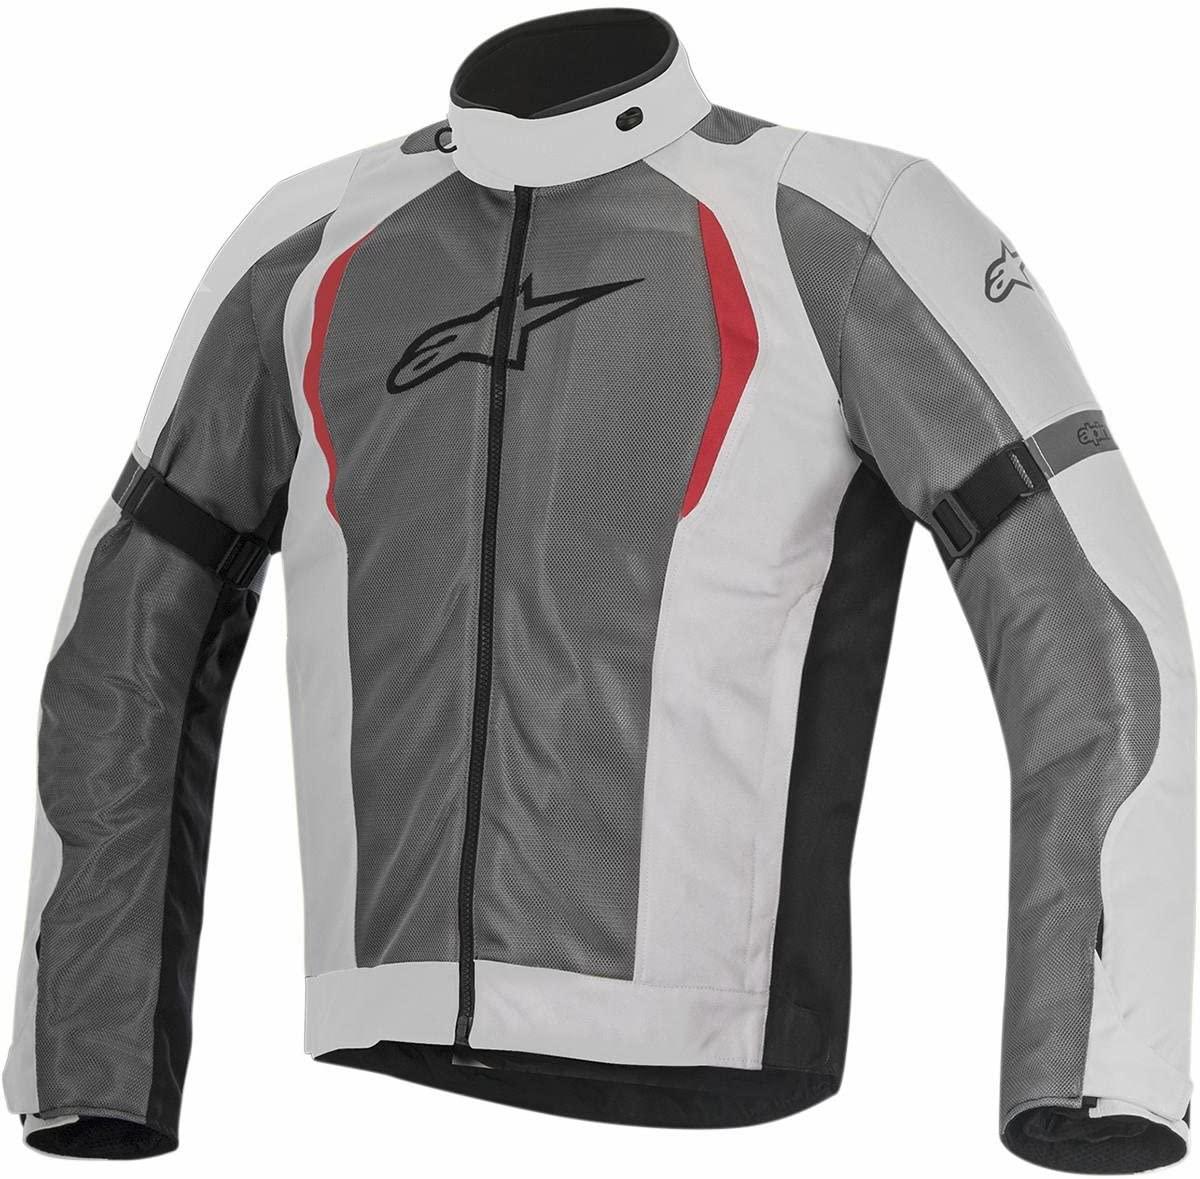 Alpinestars Men's Amok Air Drystar Motorcycle Jacket, Light Gray/Dark Gray, 2X-Large